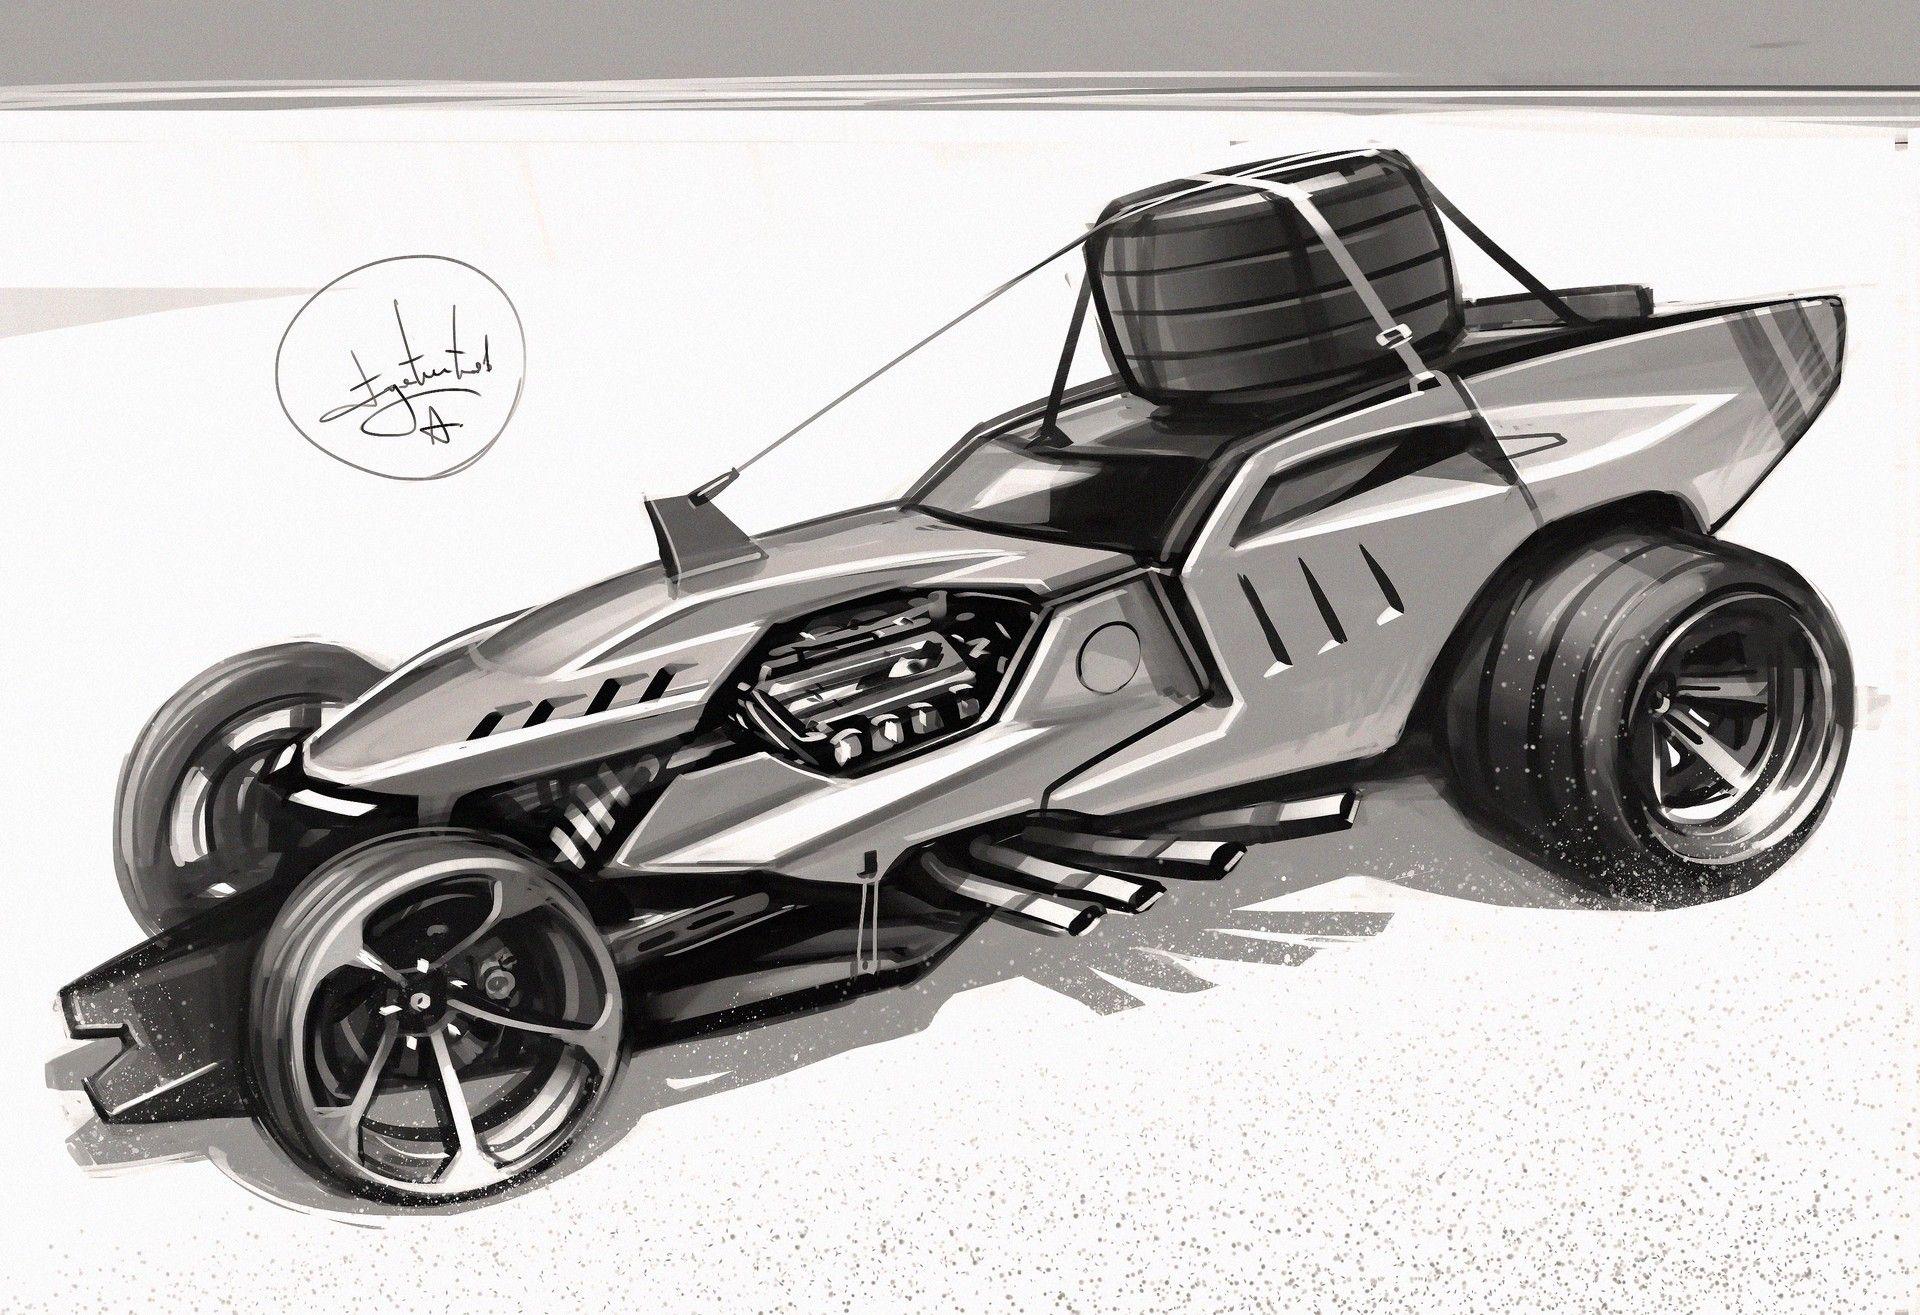 Sketch By Aleksandr Sidelnikov On Artstation In 2020 Sports Car Vehicles Rc Cars